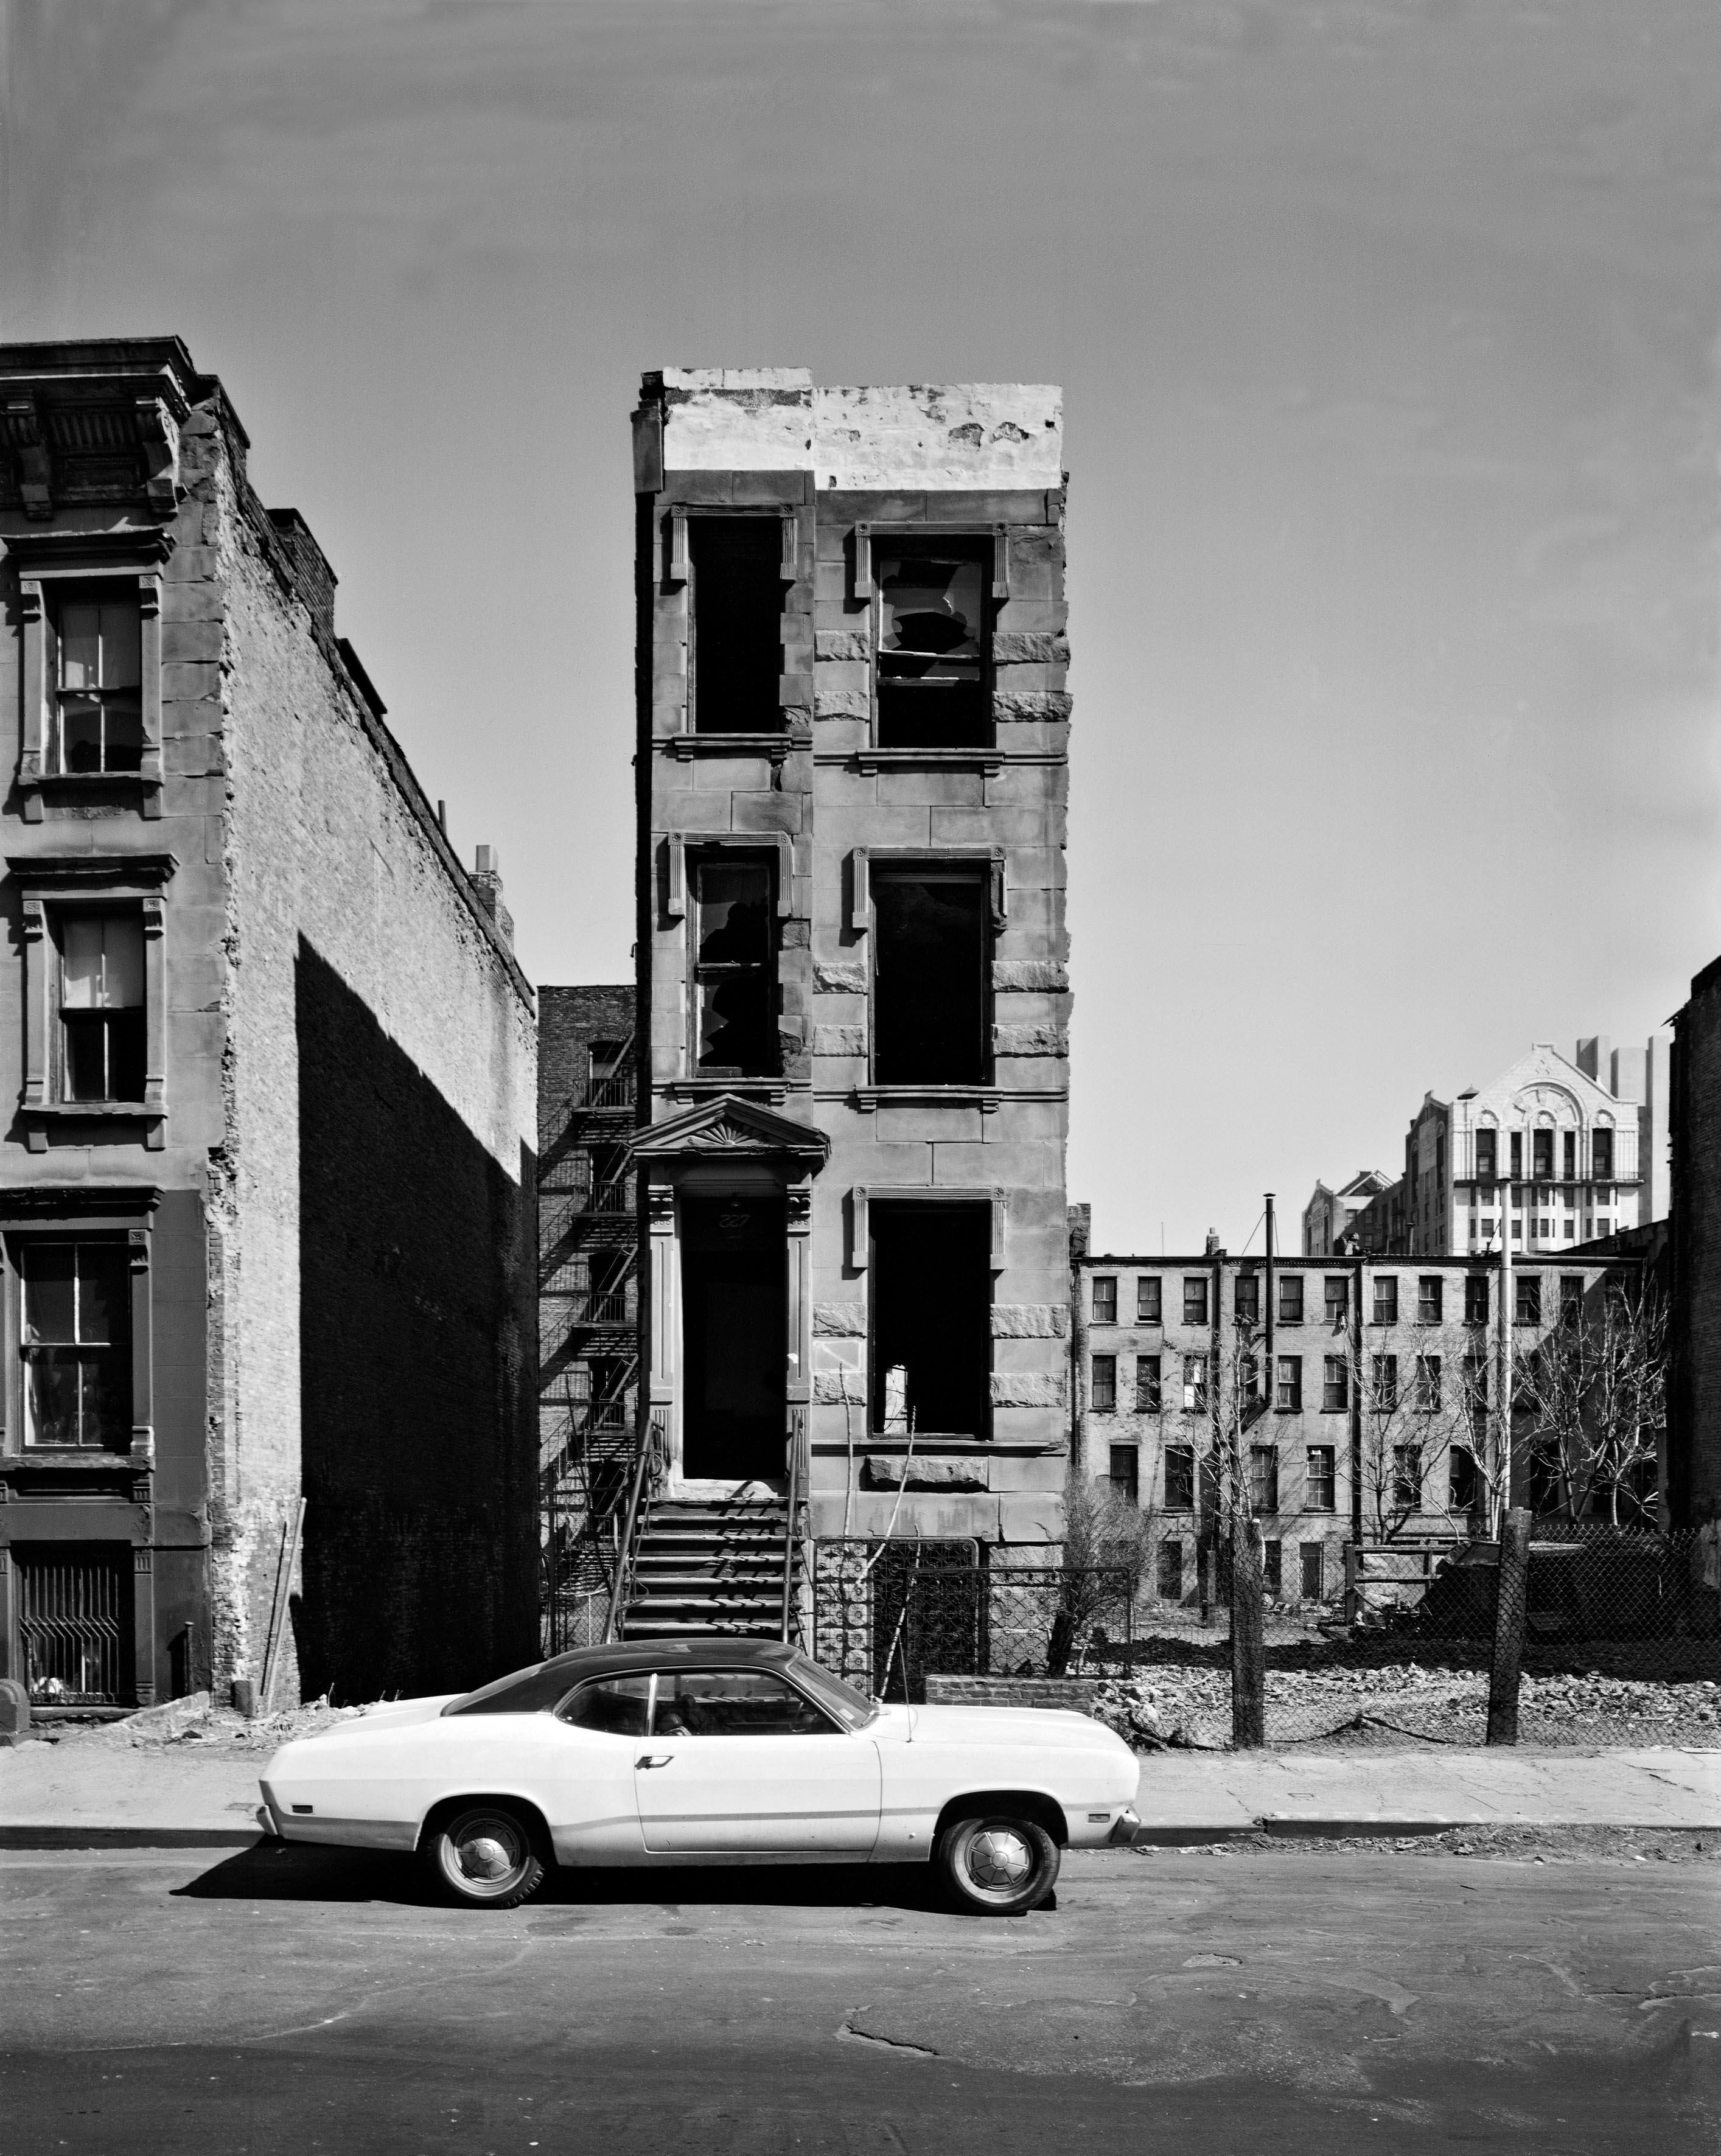 West 122nd Street, 1979.